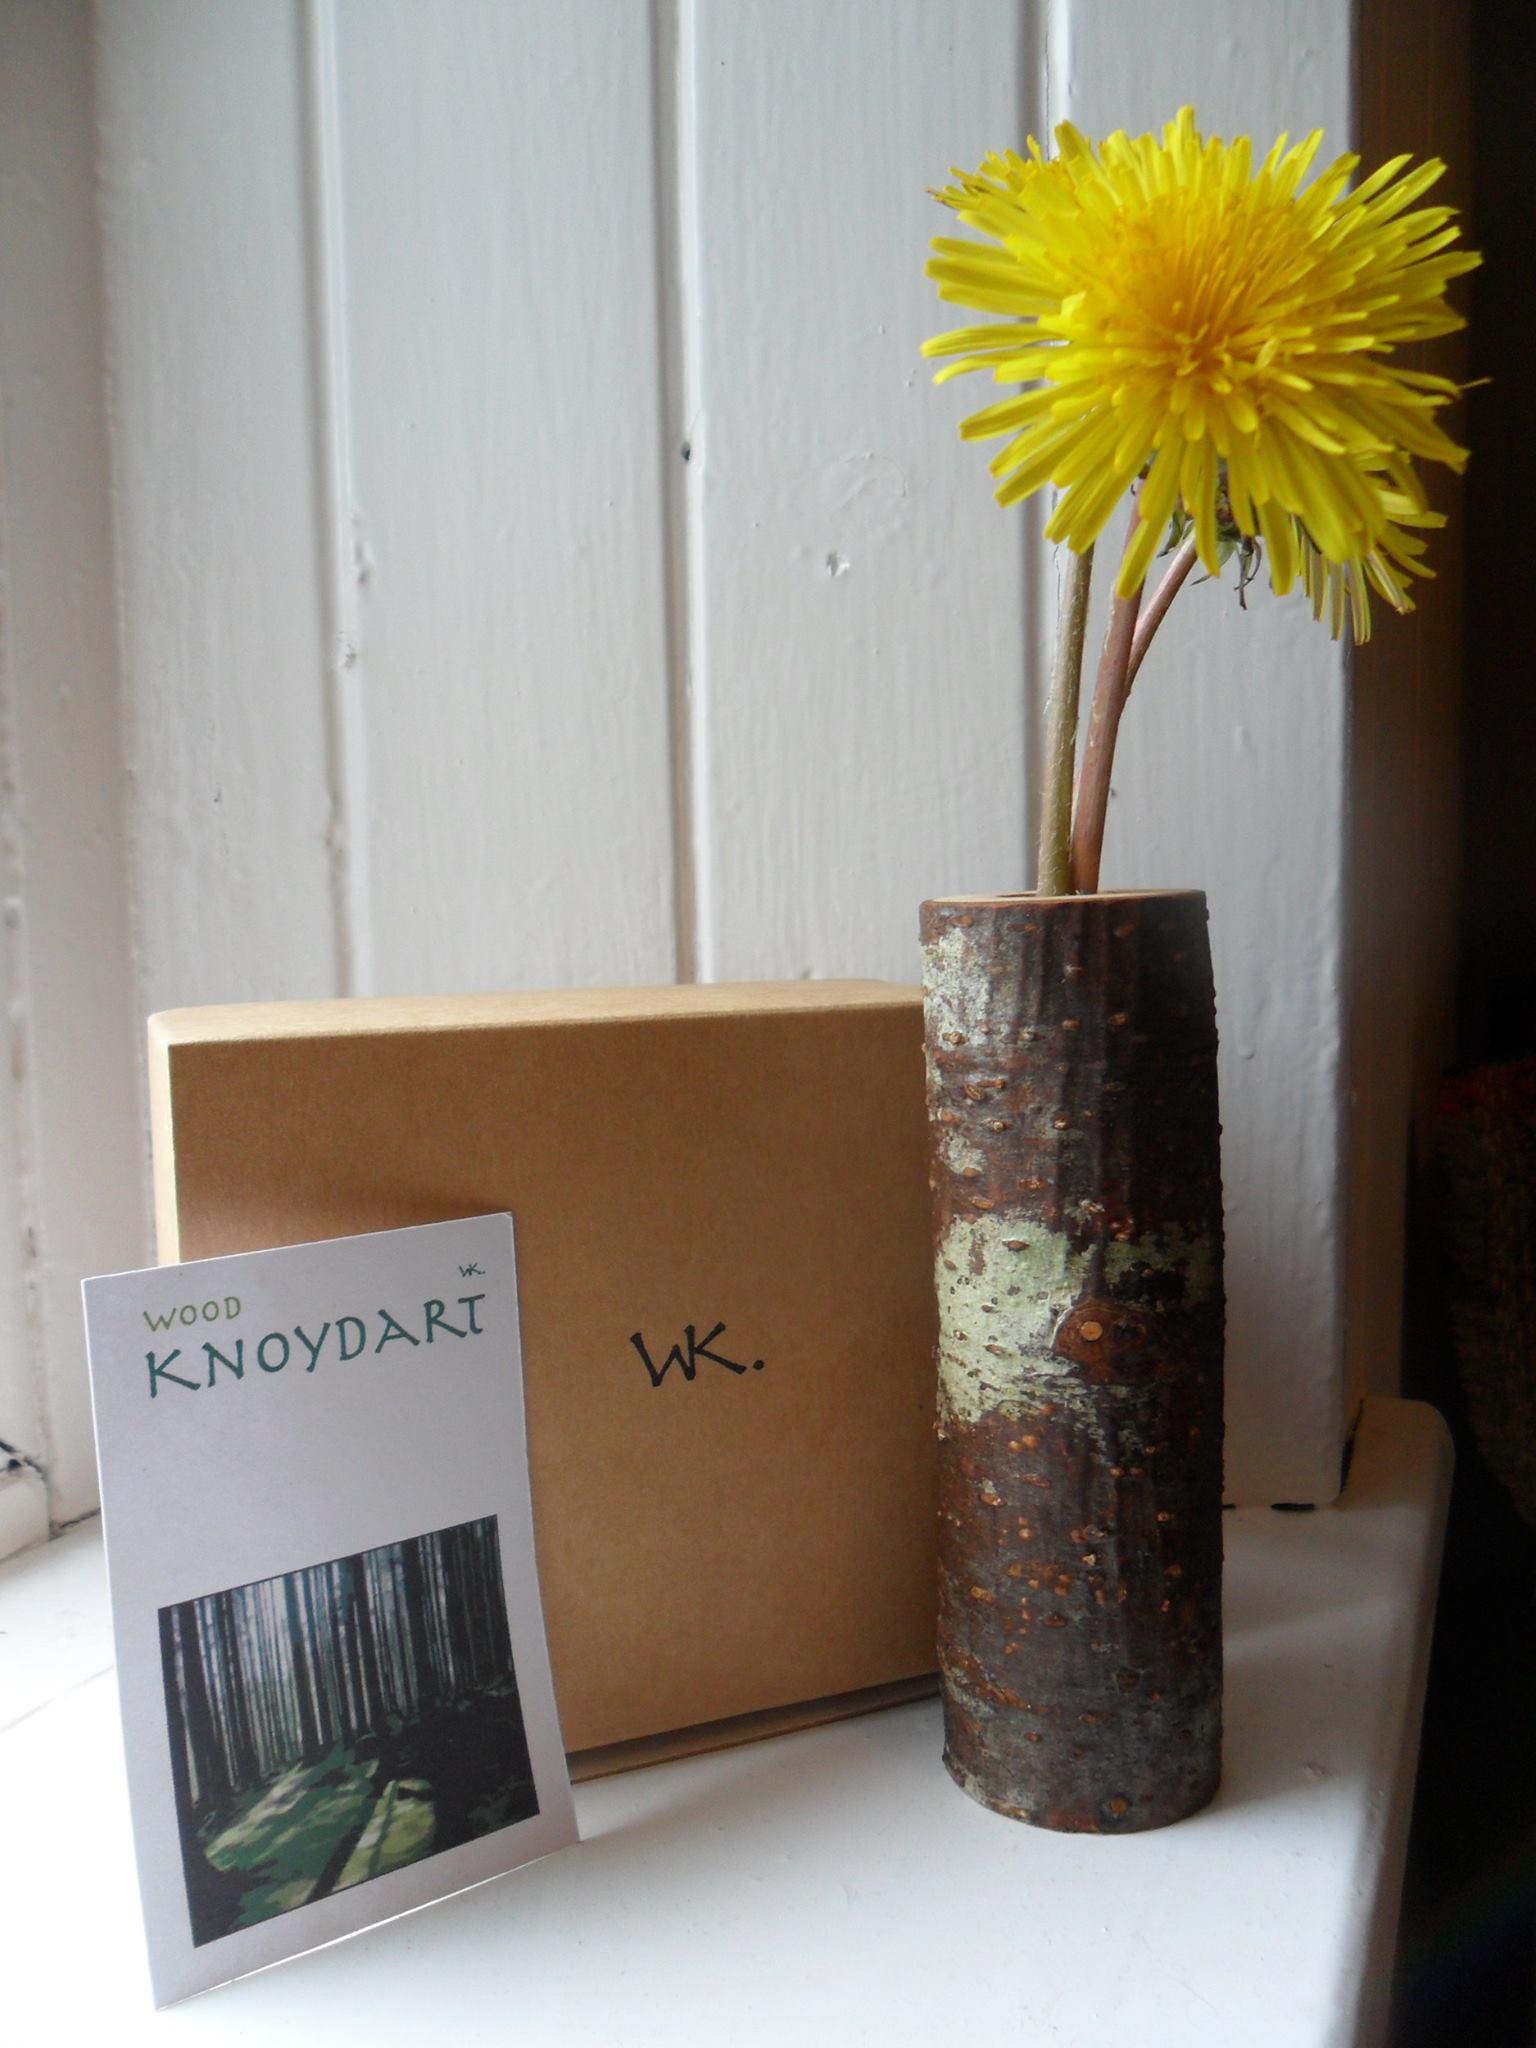 Wood Knoydart